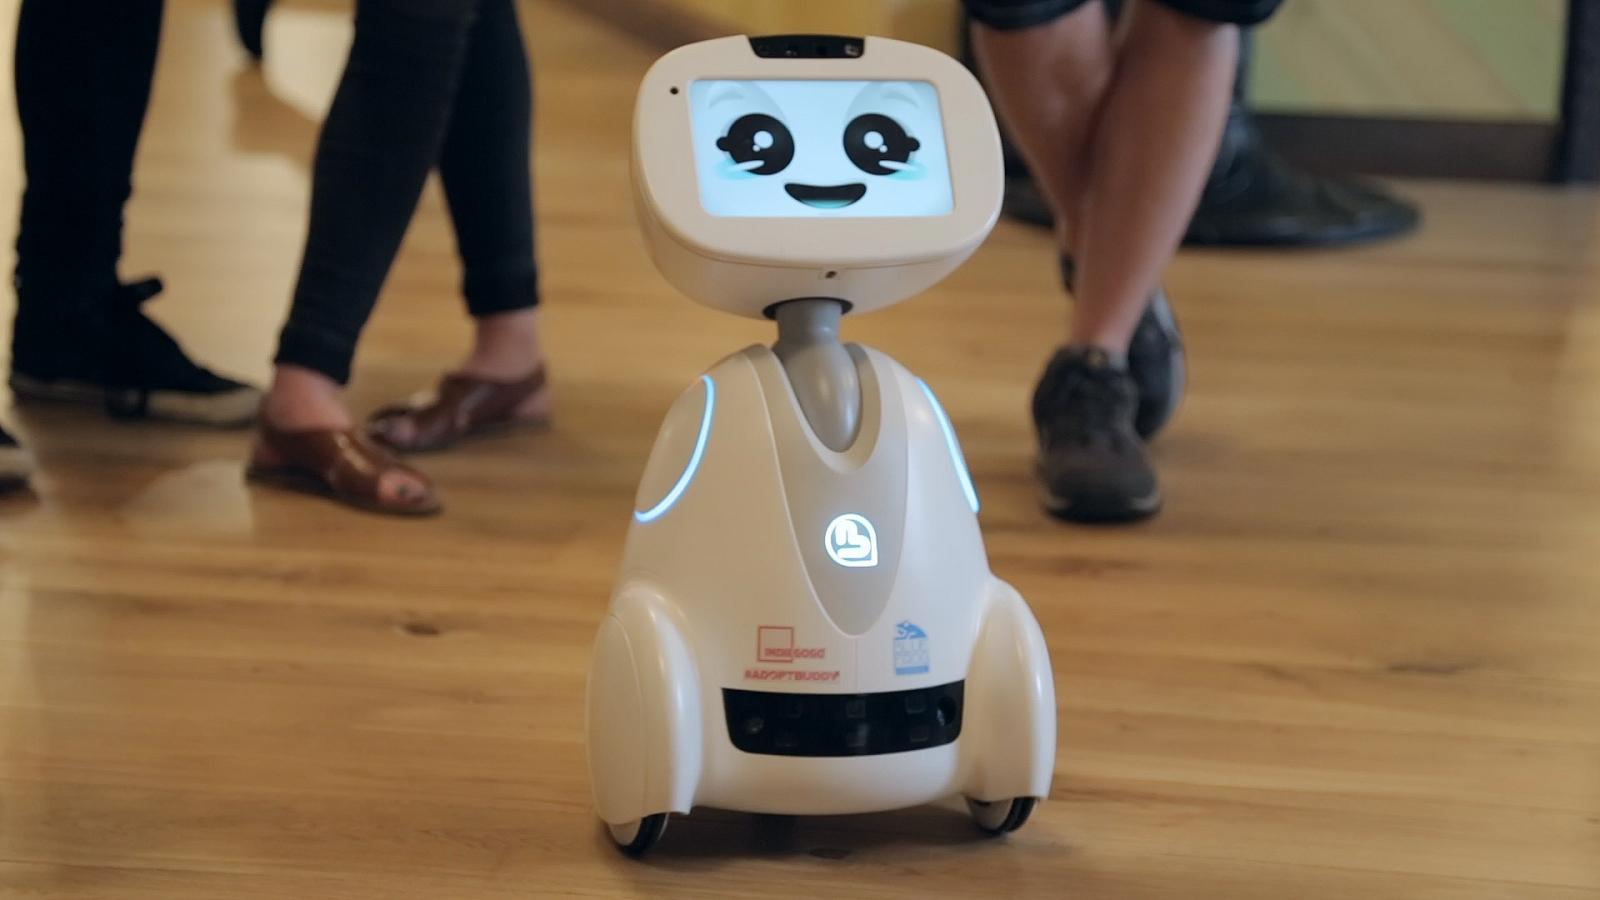 Buddy the robot